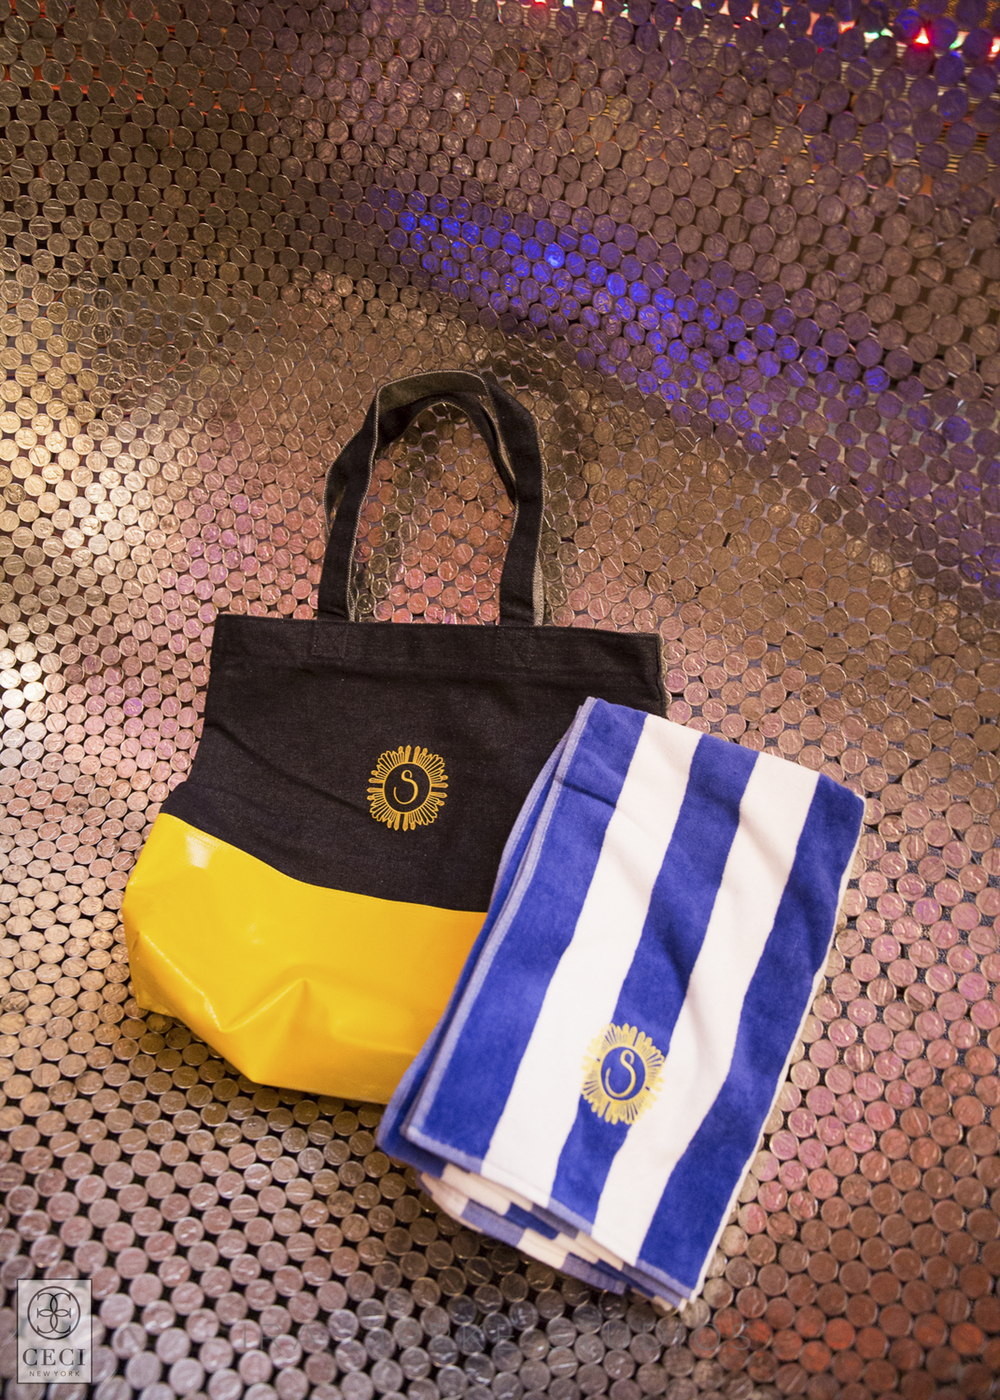 ceci_new_york_kids_party_luxury_invitation_blue_turquoise_teal_gold_bar_bat_mitzvah_art_deco_modern_event_planning_four_seasons_new_york_city-5.jpg